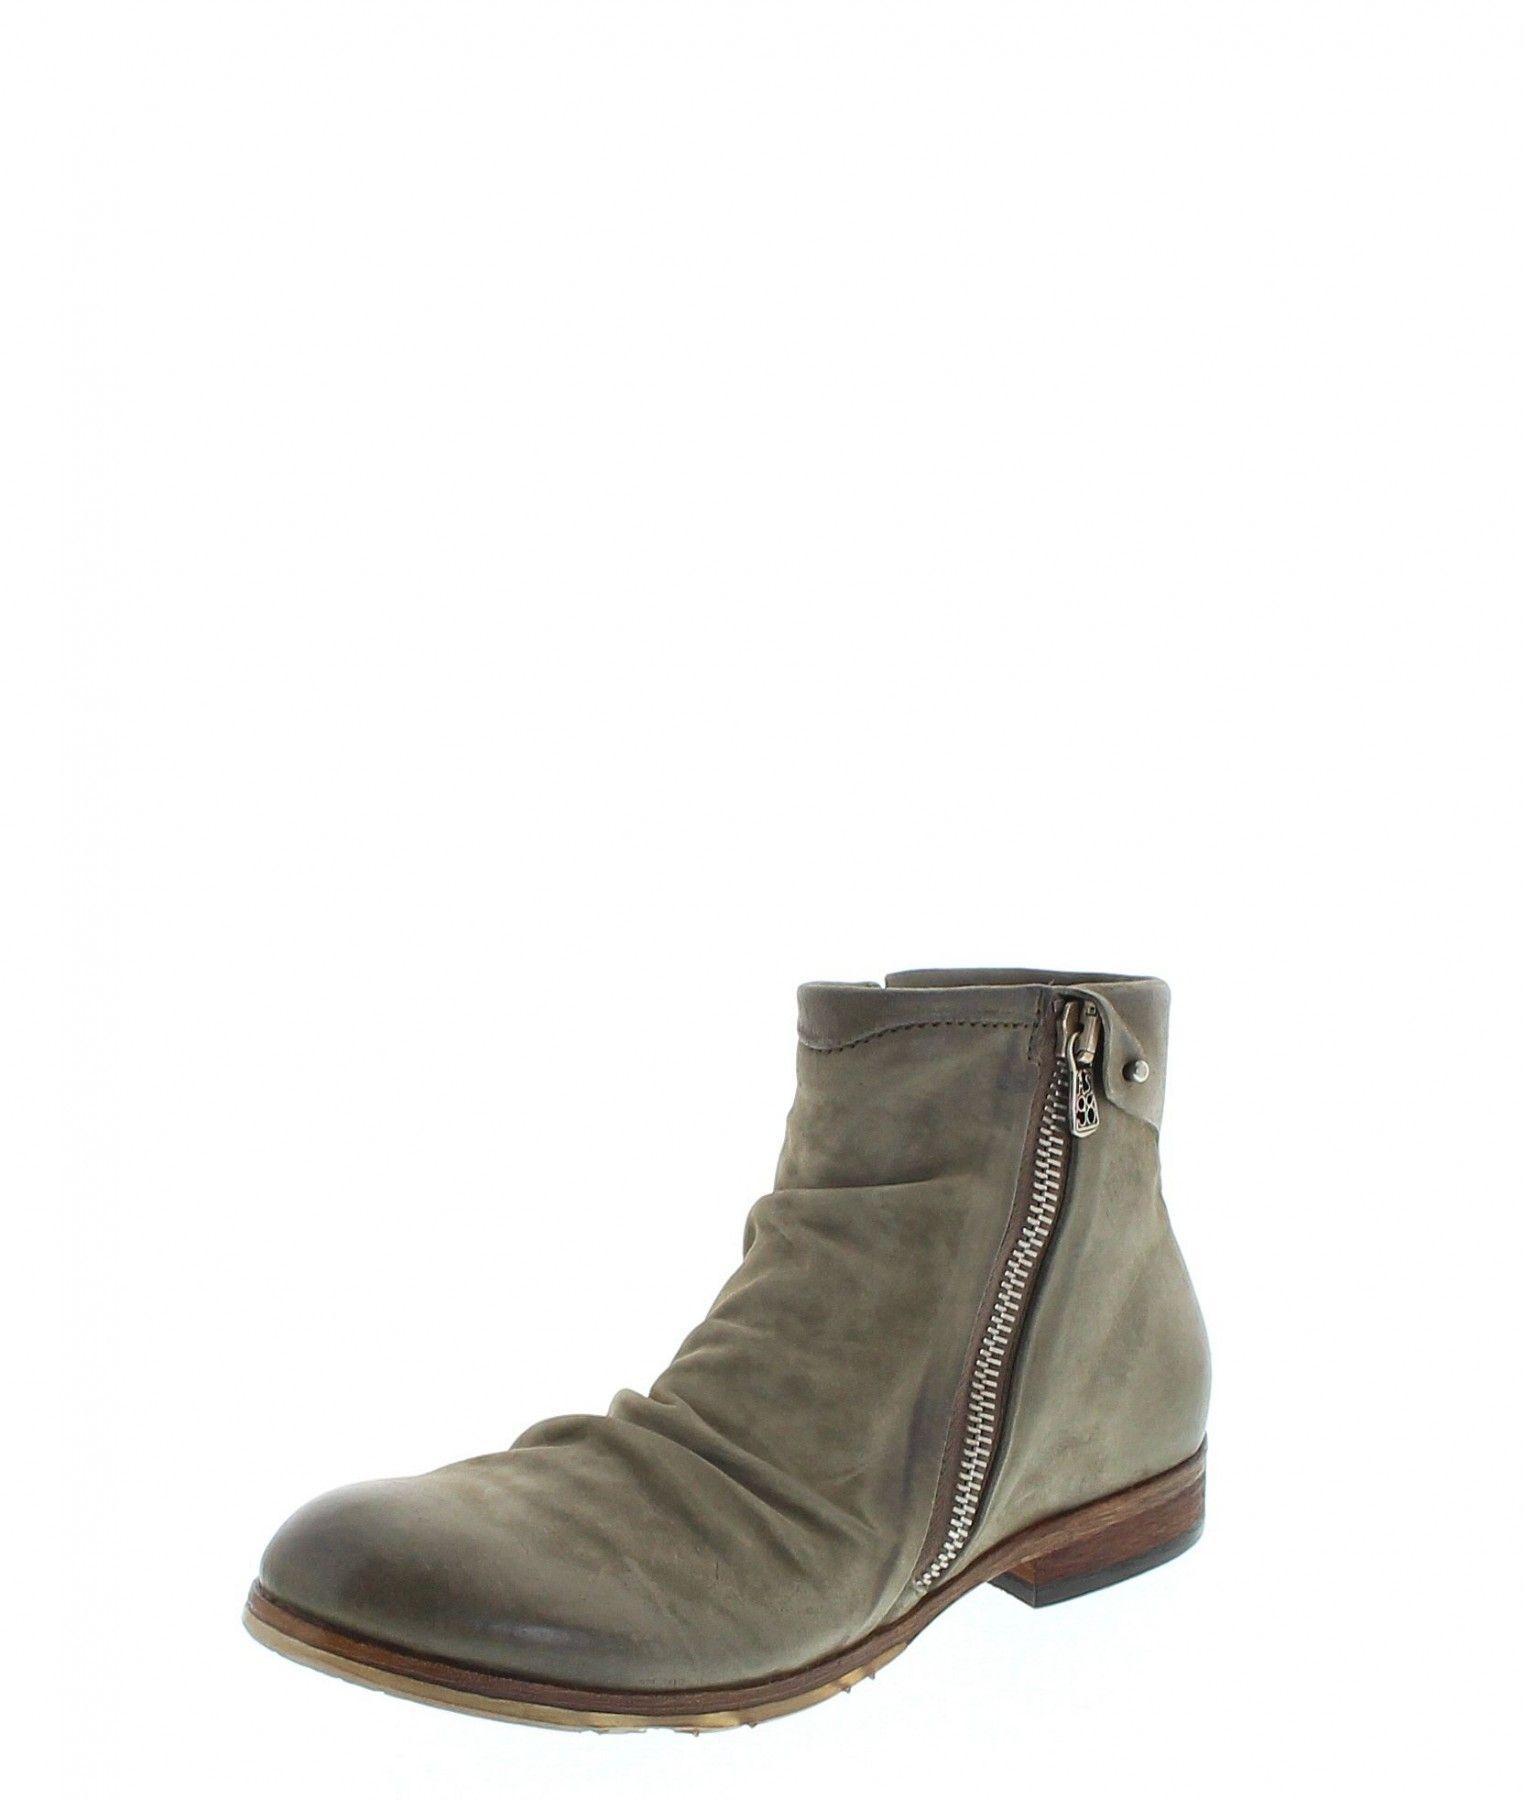 A S 98 401216 Militare Fashion Schuh Grun Boots Fashion Boots Ankle Boot